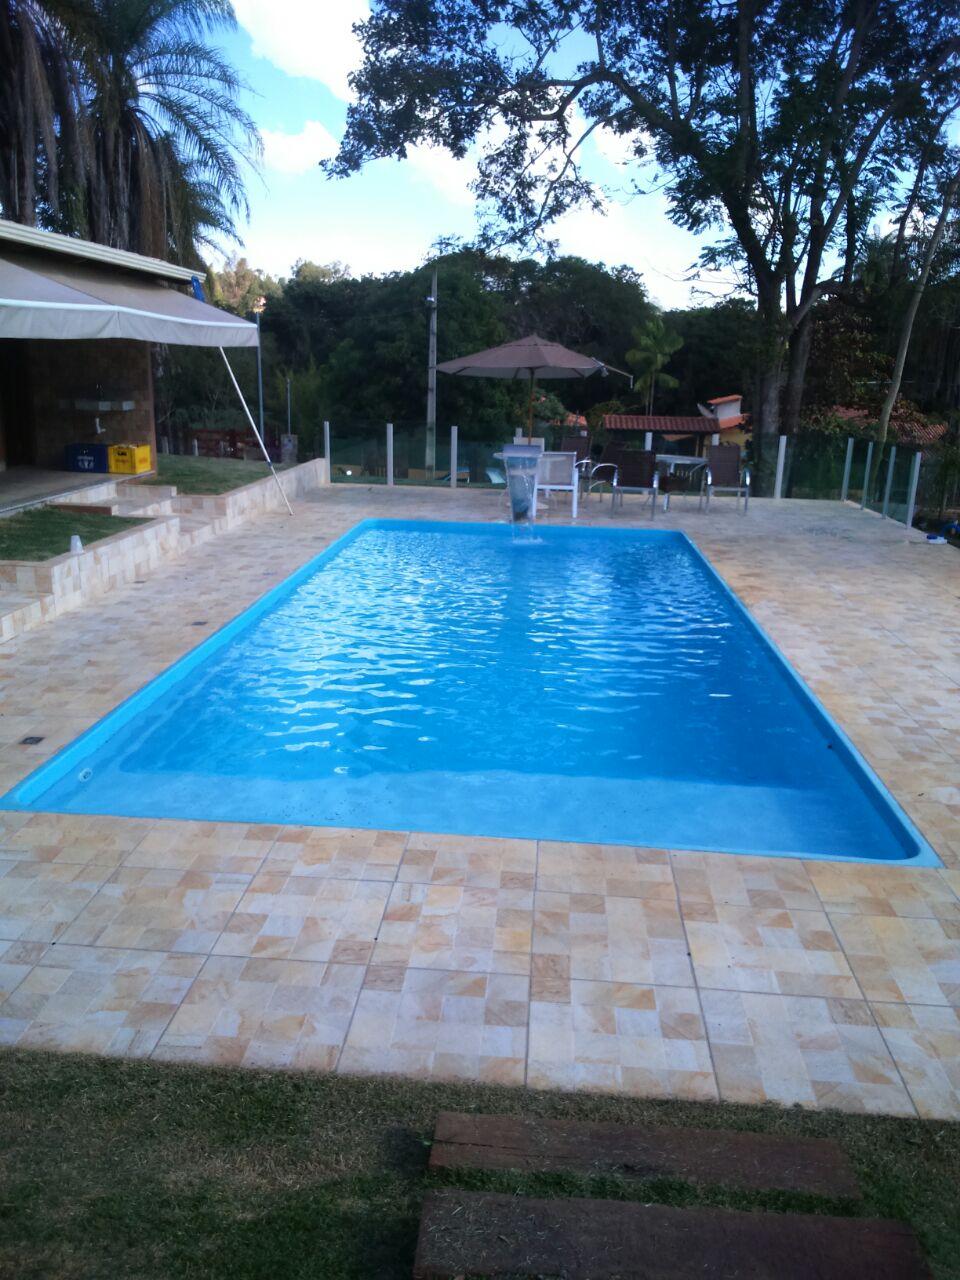 Piscina de fibra bh - Fotos de piscinas ...